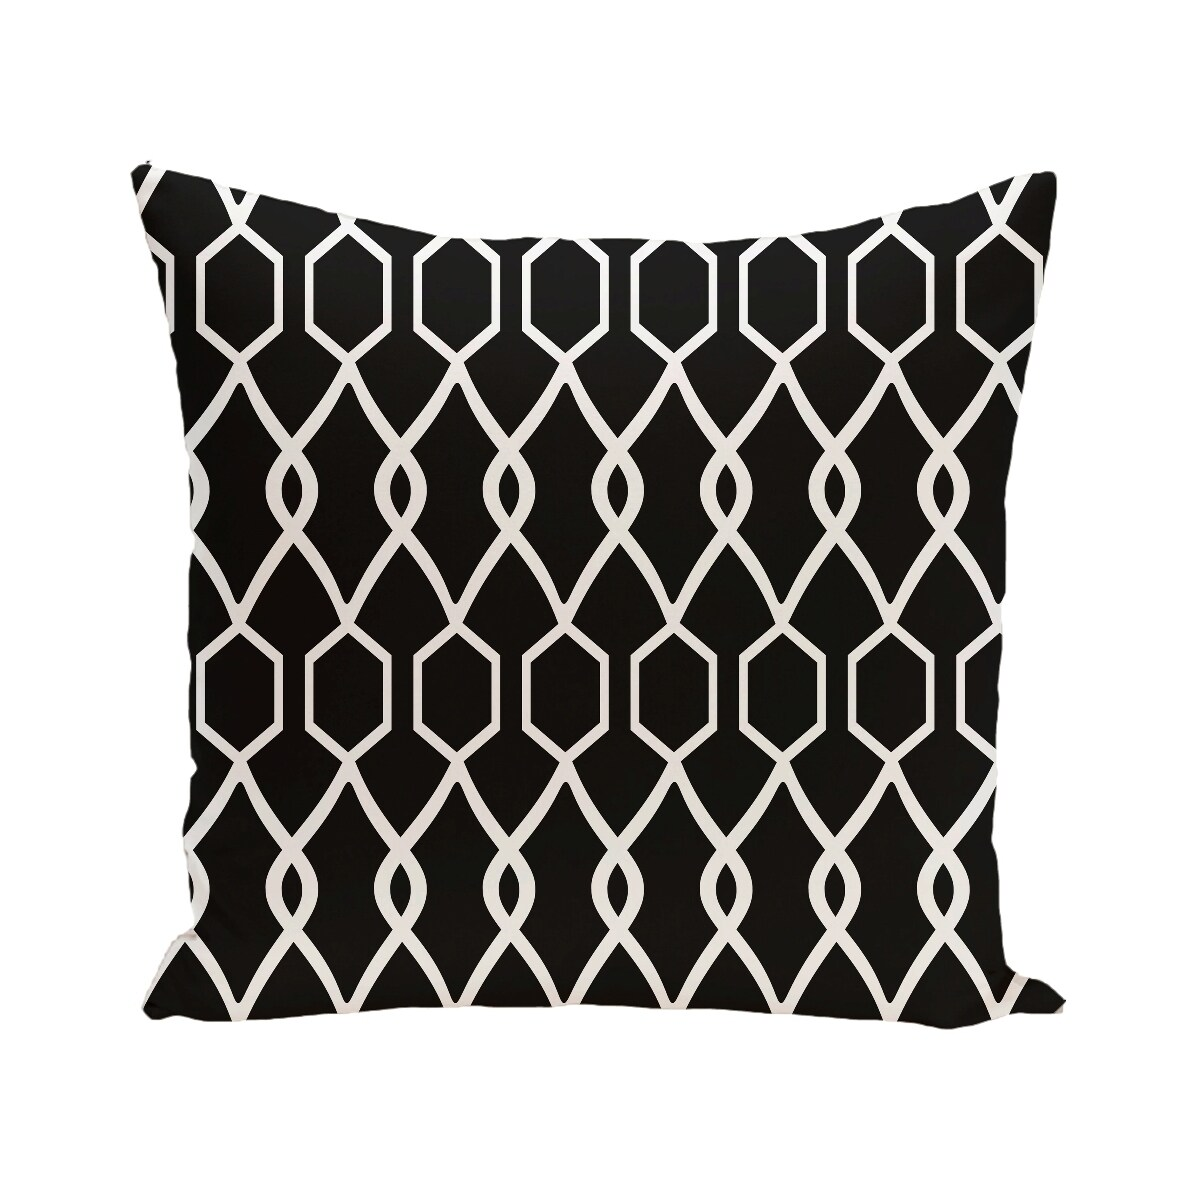 Geometric Print Blue/ Black/ Grey/ Yellow/ Brown 28-inch x 28-inch Decorative Indoor Floor Pillow (Navy Blue)